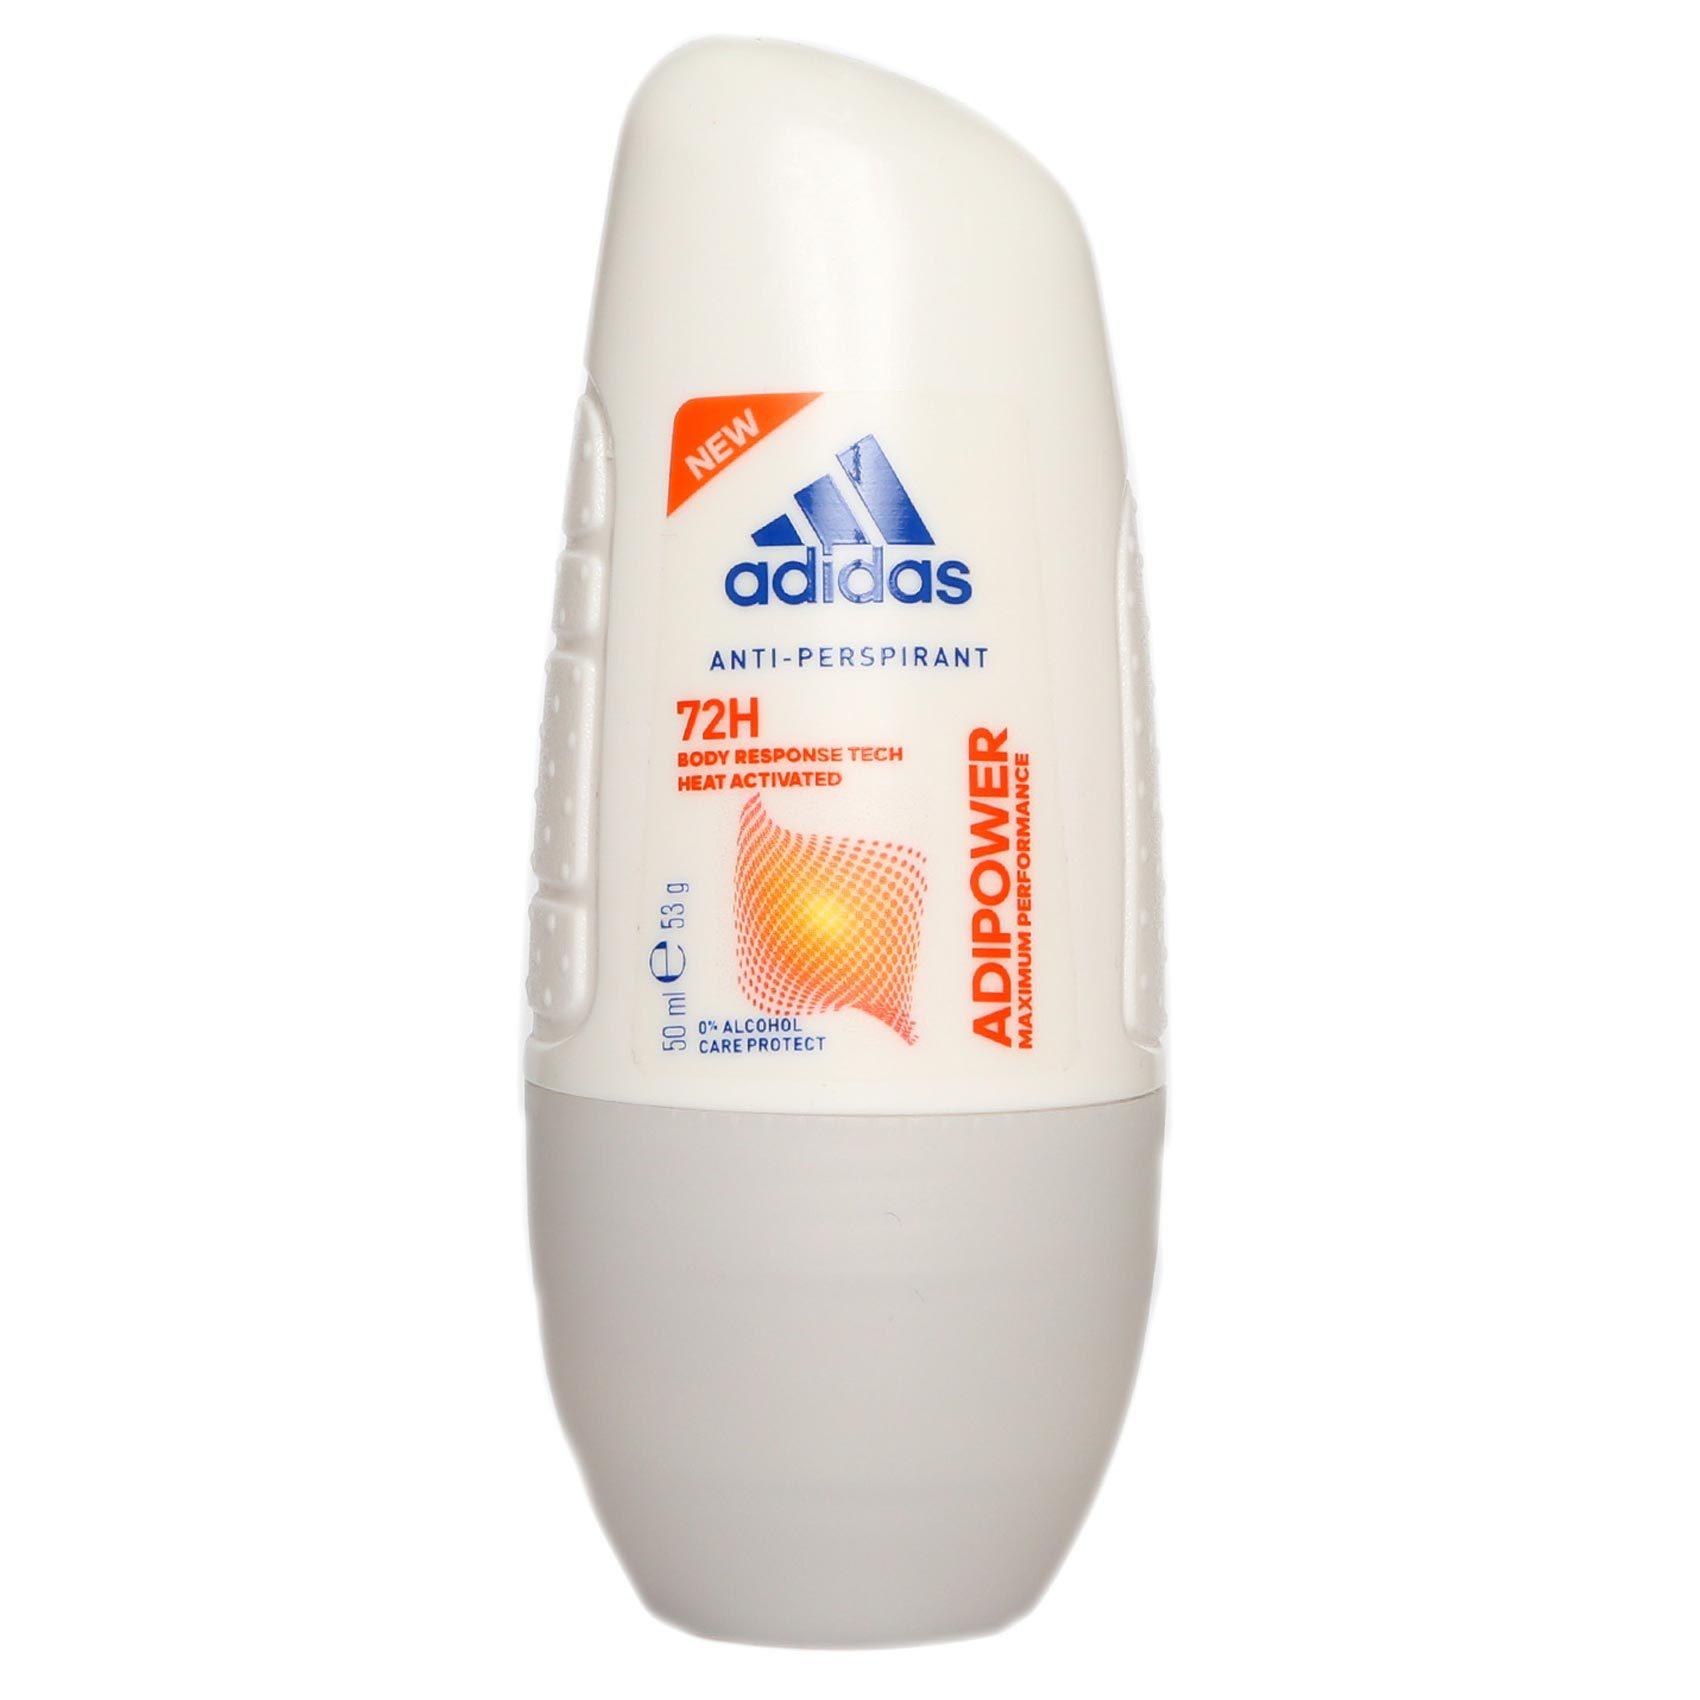 tienda de comestibles Represalias salir  Buy Adidas Adipower Antiperspirant Roll-On Women 50ml Online - Shop Beauty  & Personal Care on Carrefour UAE